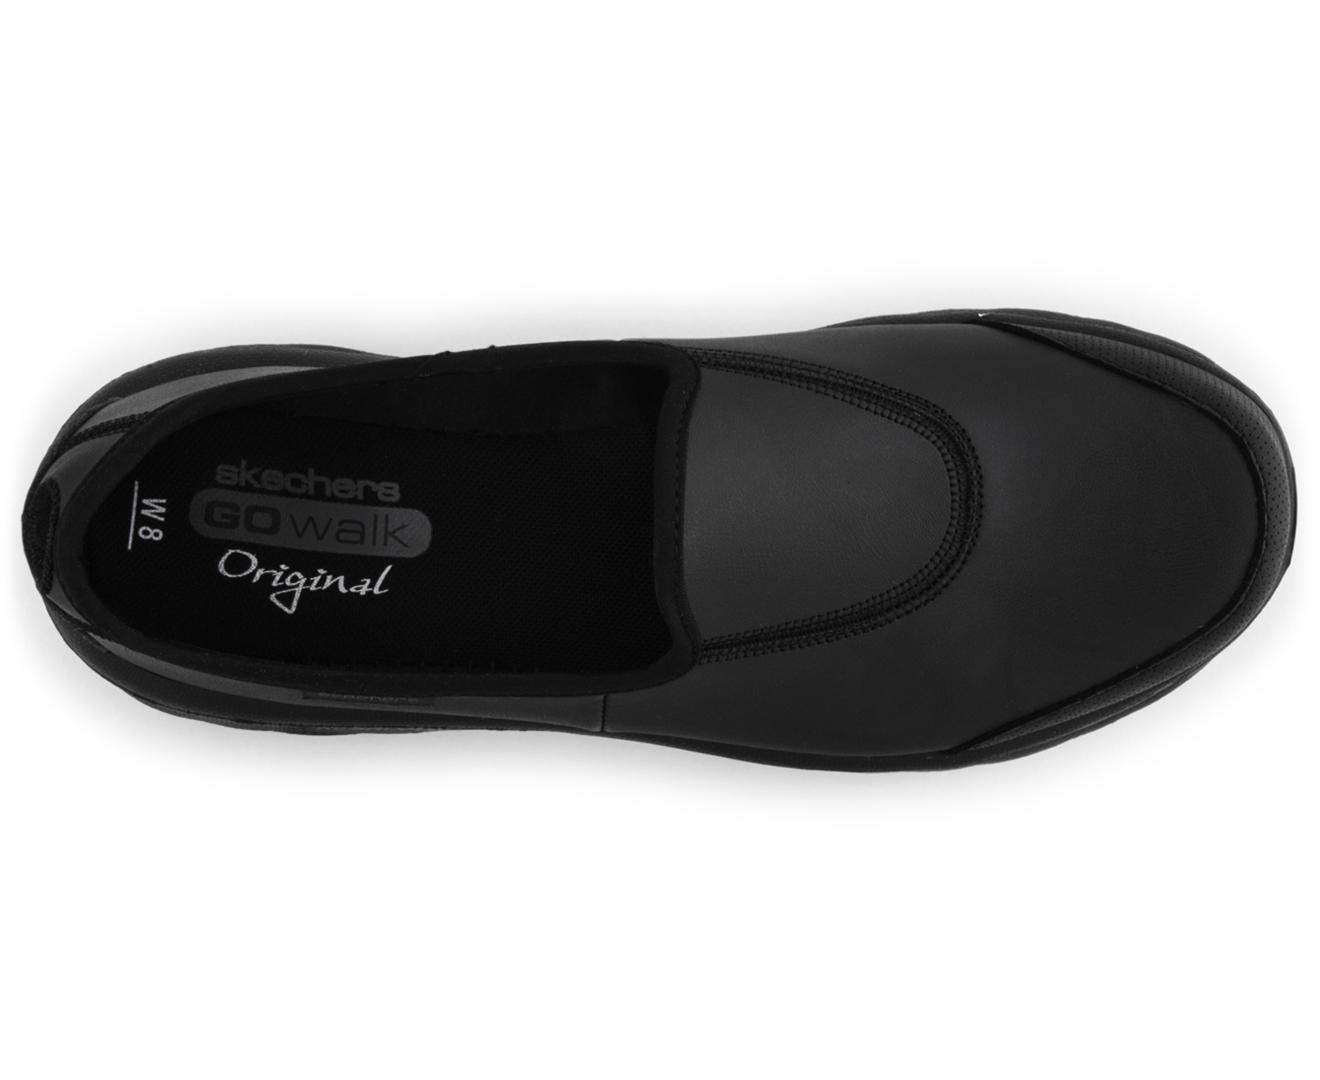 c4e642a6a08 Skechers Women's GoWalk Undercover Shoe - Black   Catch.com.au